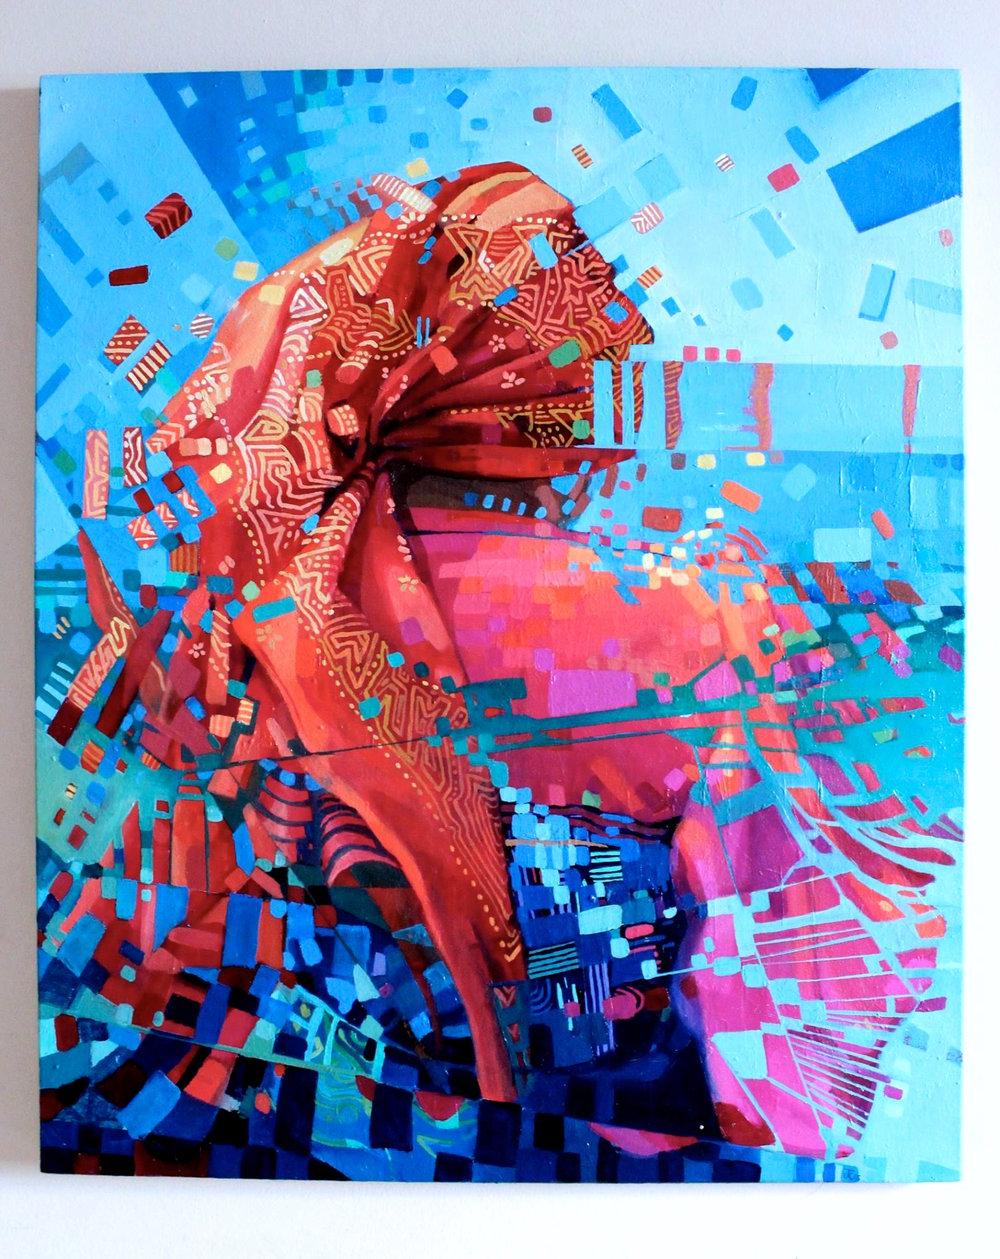 Copy of San Blas Wrap Life, 2015. Oil on canvas. 24x36